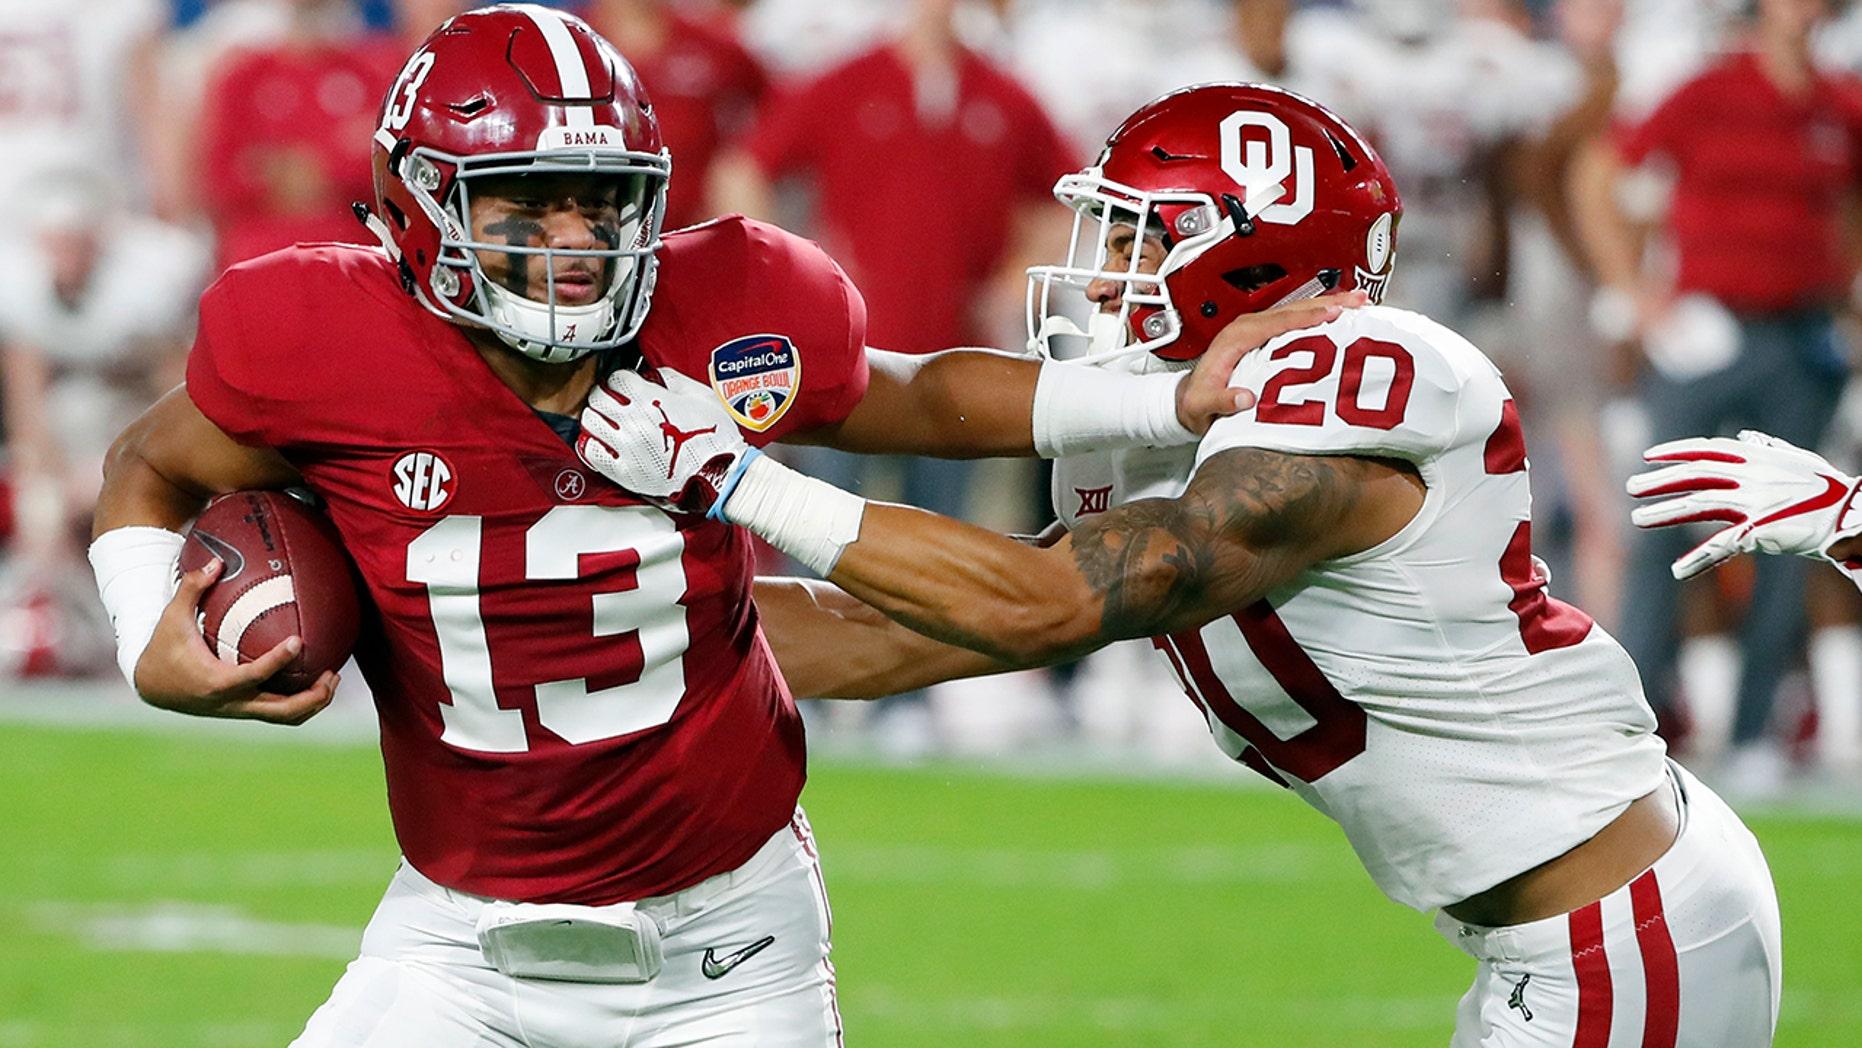 Alabama quarterback Tua Tagovailoa (13) fights off Oklahoma safety Robert Barnes (20), during the first half of the Orange Bowl NCAA college football game, Saturday, Dec. 29, 2018, in Miami Gardens, Fla. (AP Photo/Wilfredo Lee)